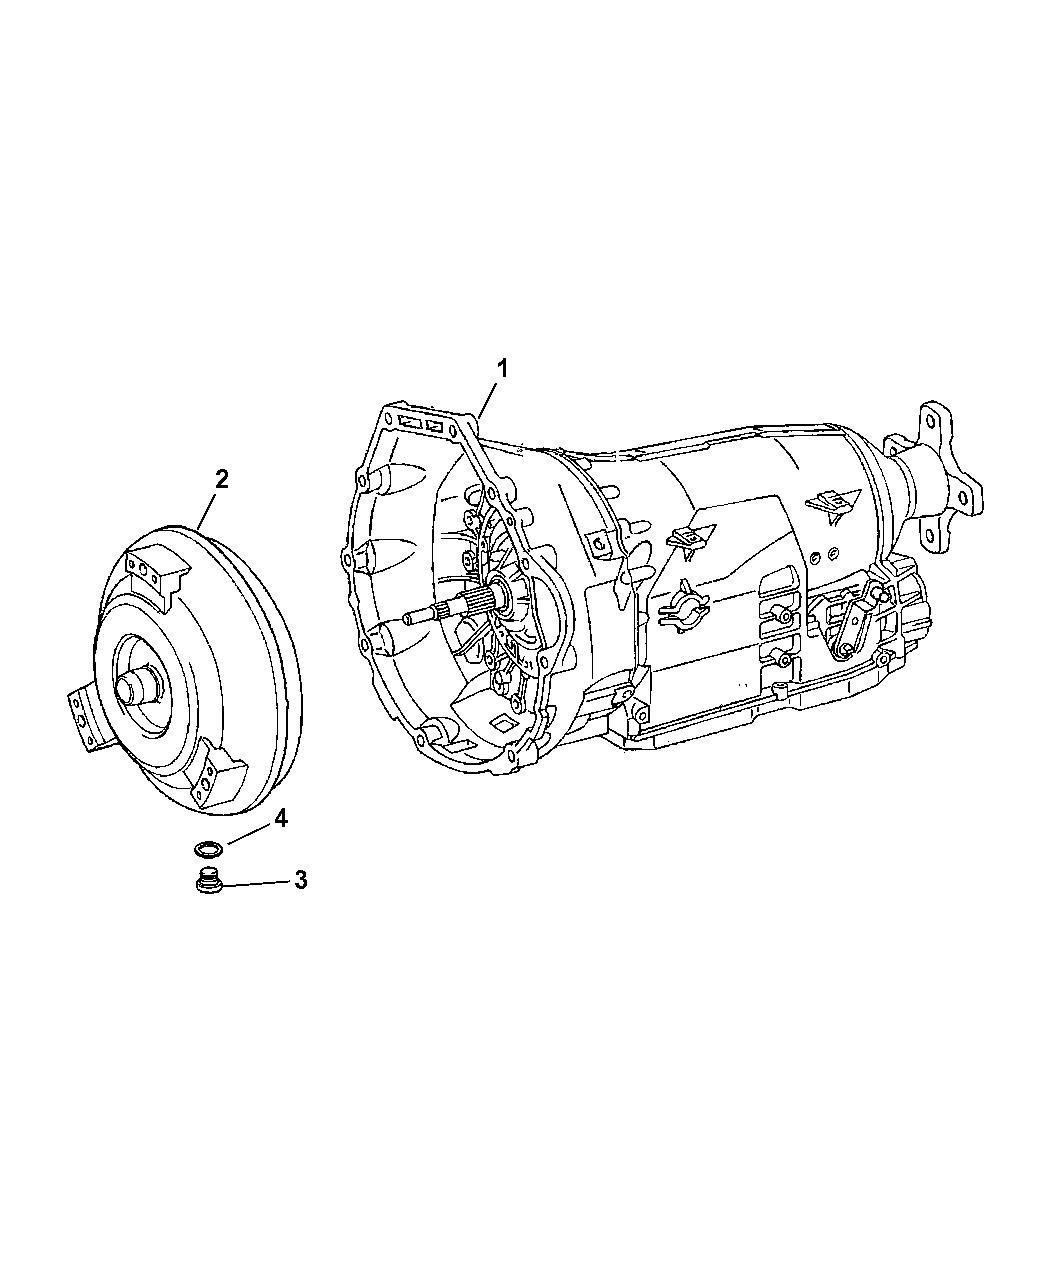 2008 Dodge Sprinter 2500 Transmission / Transaxle Assembly